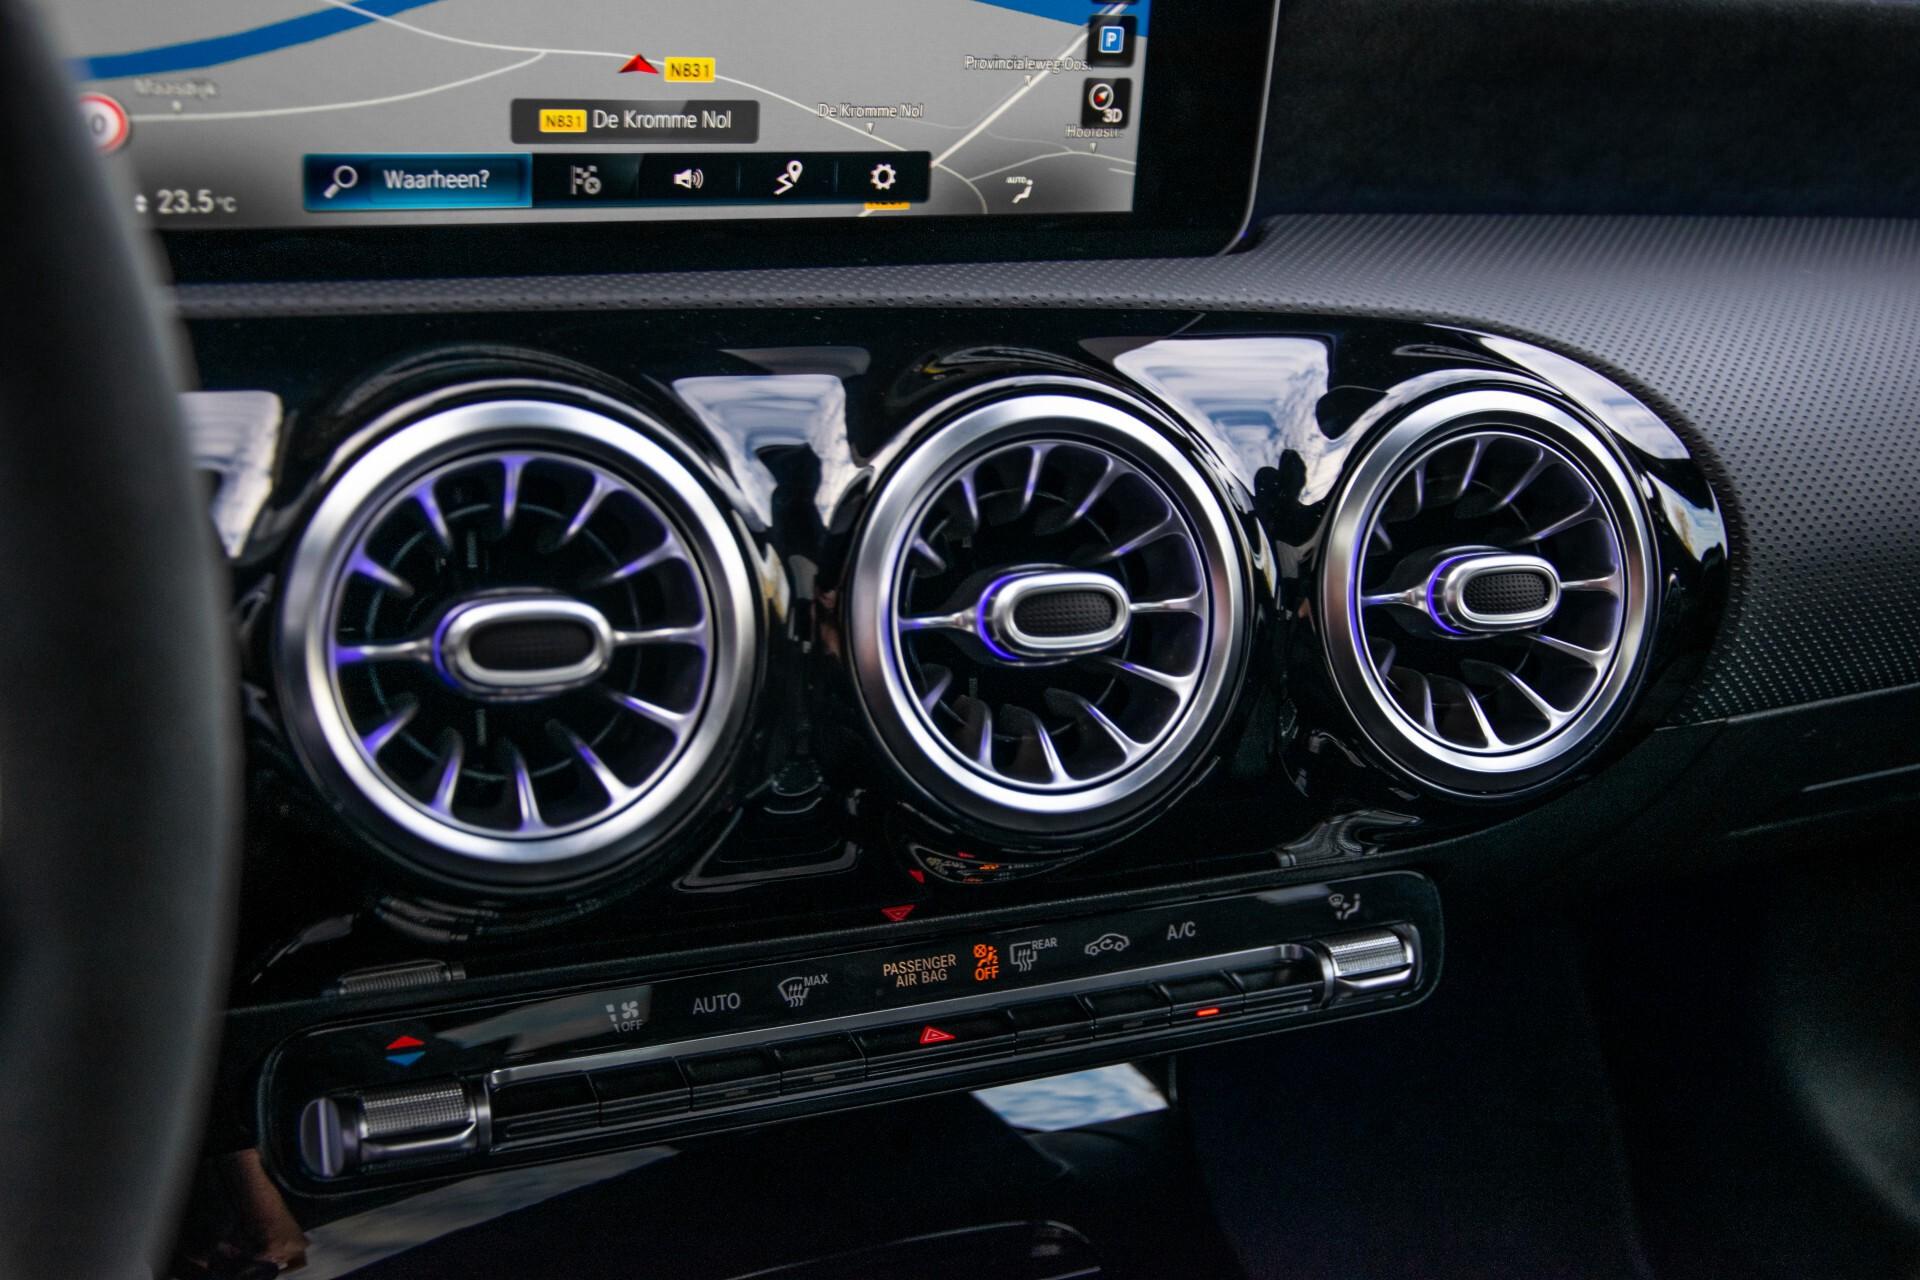 Mercedes-Benz A-Klasse 250 4-M AMG Panorama/Keyless-Entry/MBUX/HUD/Burmester/360/Multibeam LED Aut7 Foto 18